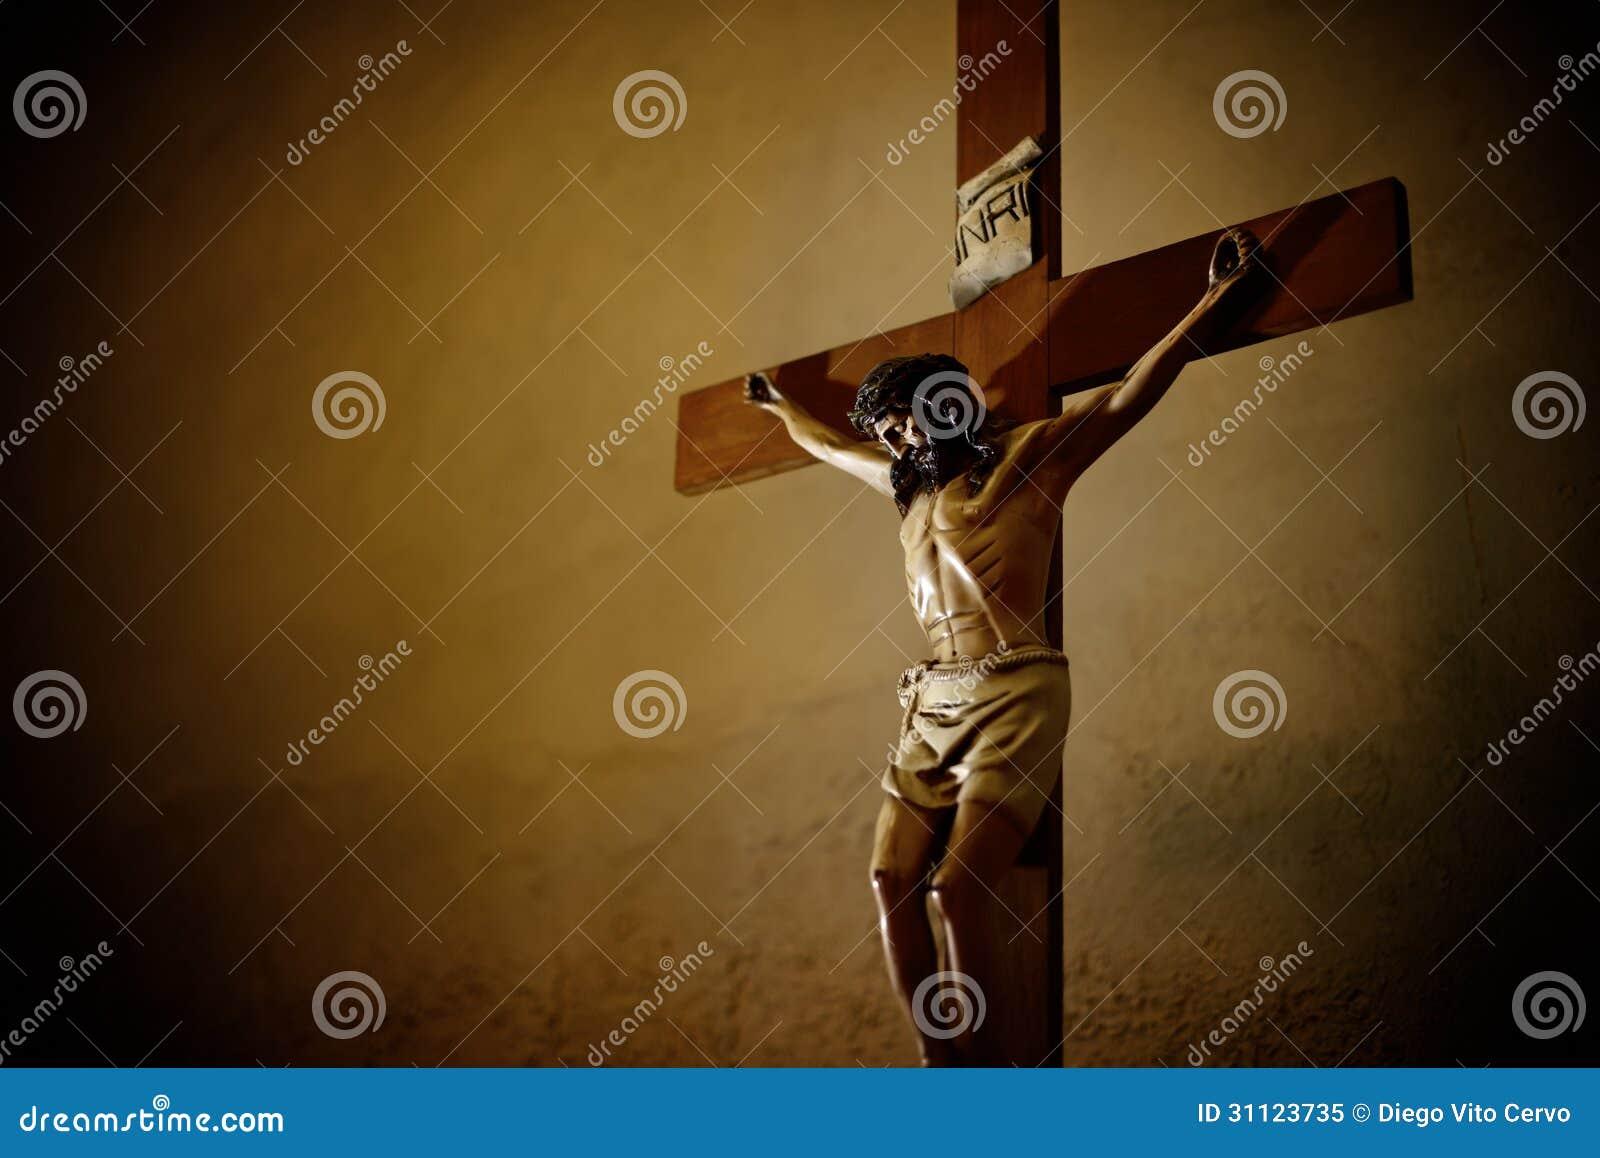 Katolsk kyrka och Jesus Christ på korset